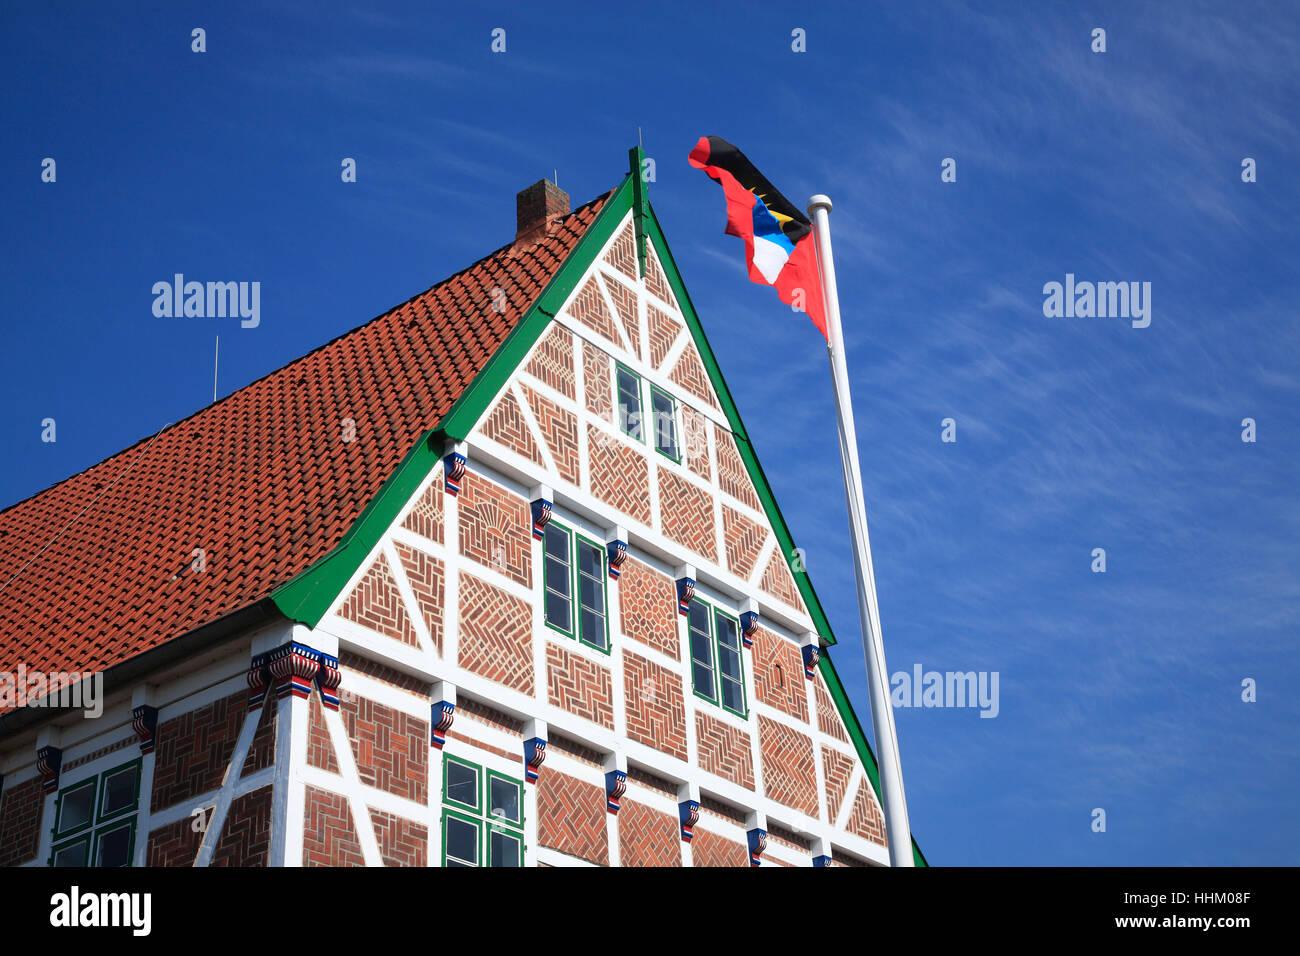 Borstel, Wehrtscher Hof, Altes Land, Lower Saxony, Germany, Europe - Stock Image